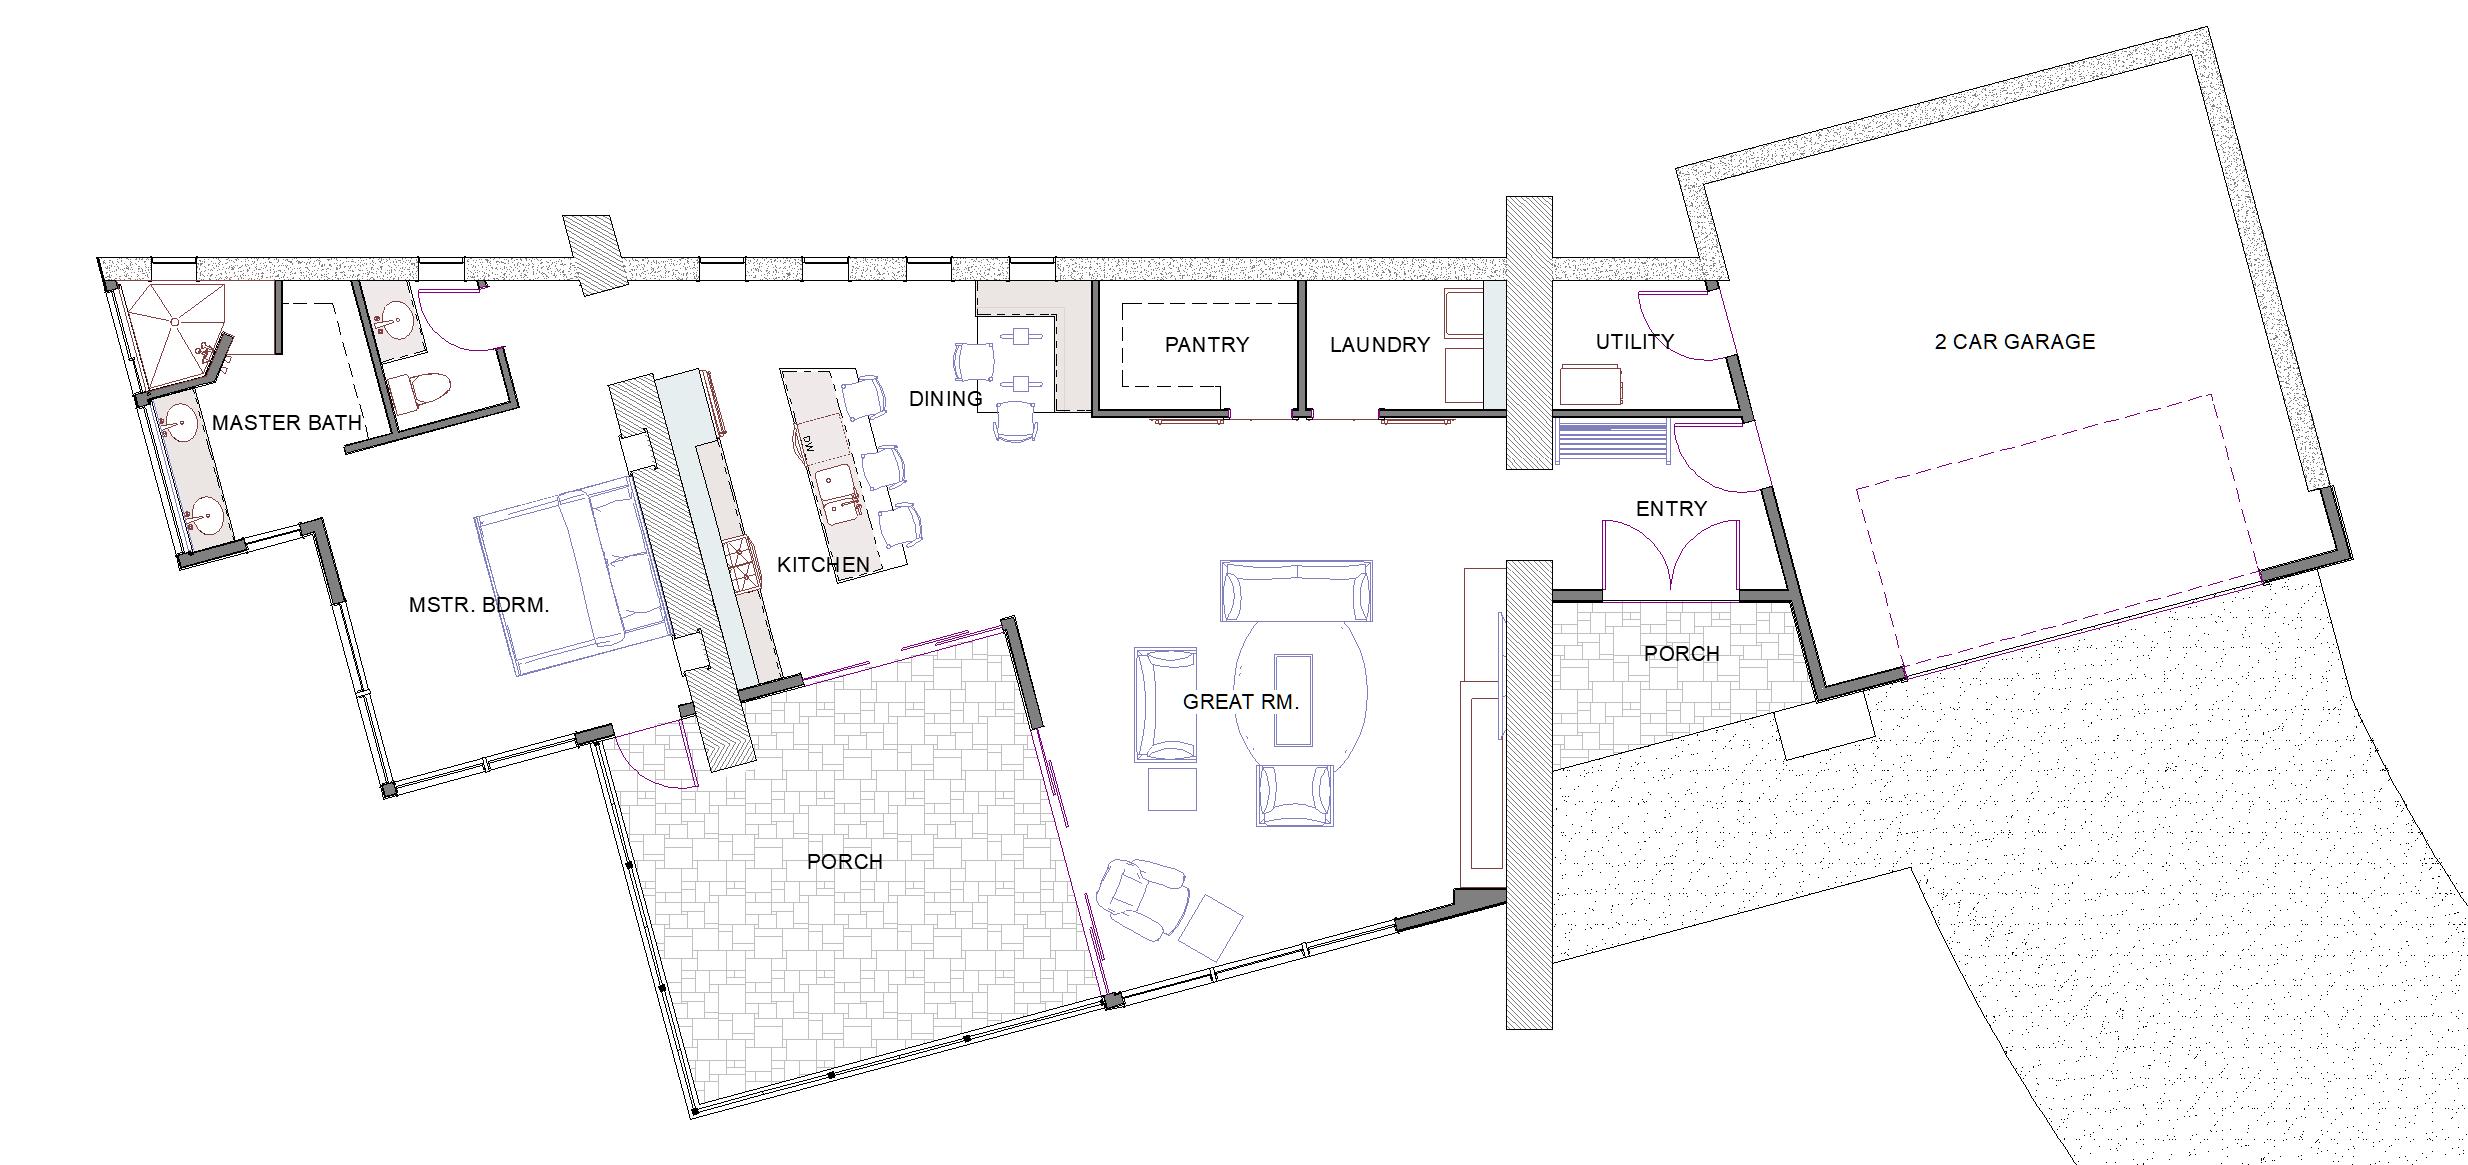 Home architectural services in Sonora CA